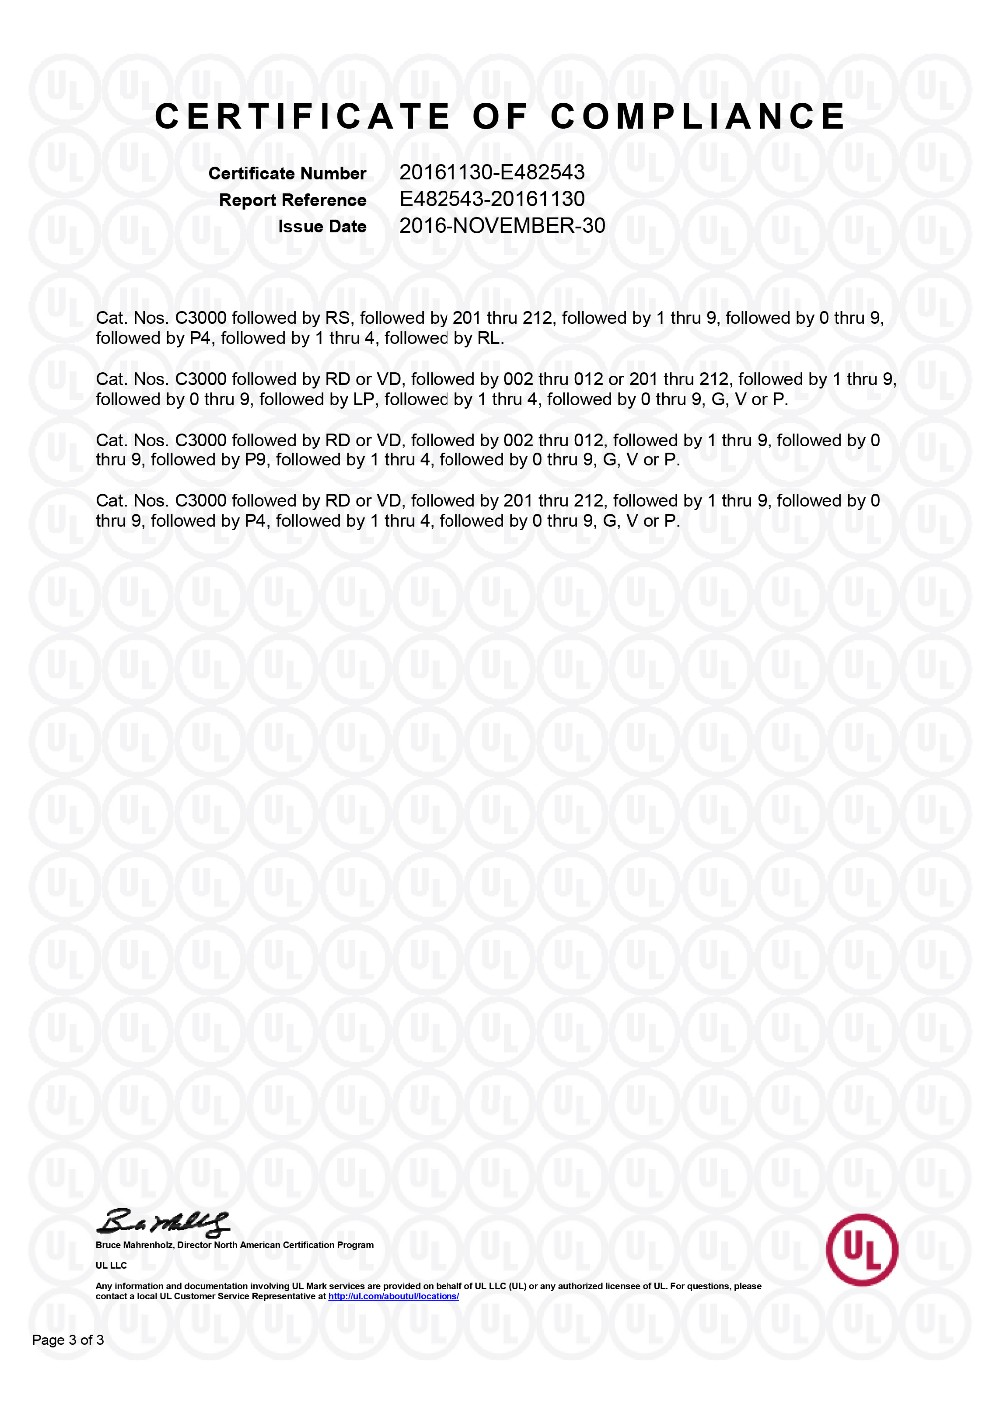 Kr2540 Mx2510 3pin Connector Wiring Harness Buy Molex 2510 3p Wire Program Ul Certification